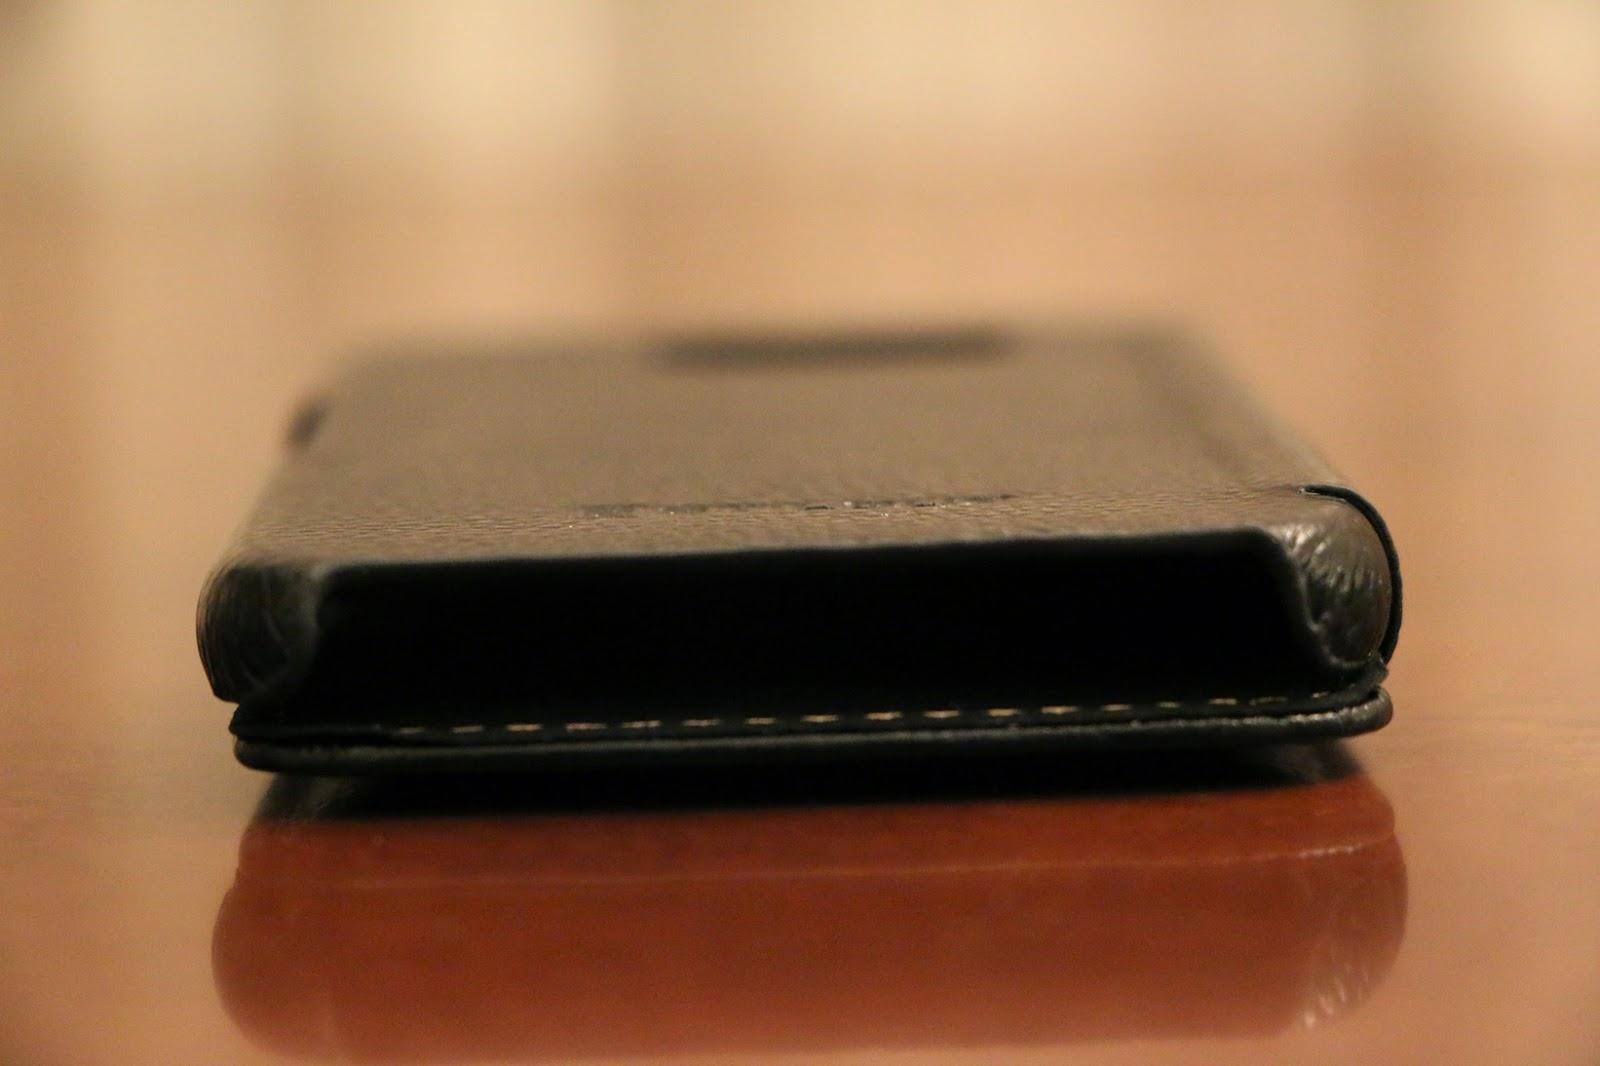 StilGut custodia Galaxy S6 modello Book Type nera aperta 2